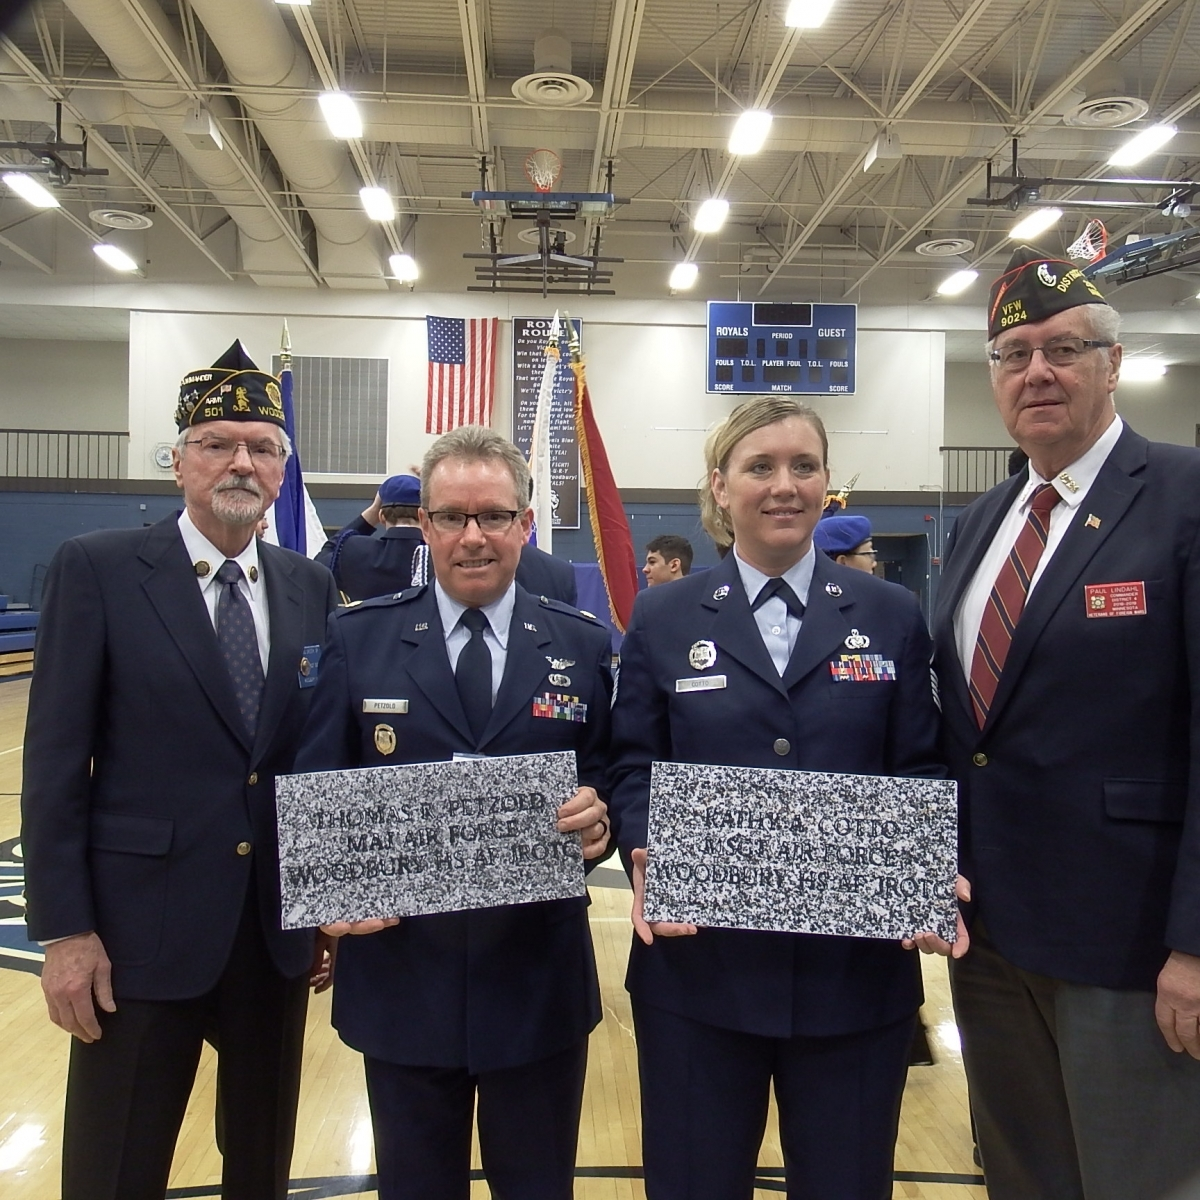 Woodbury High School Veterans Day Ceremony